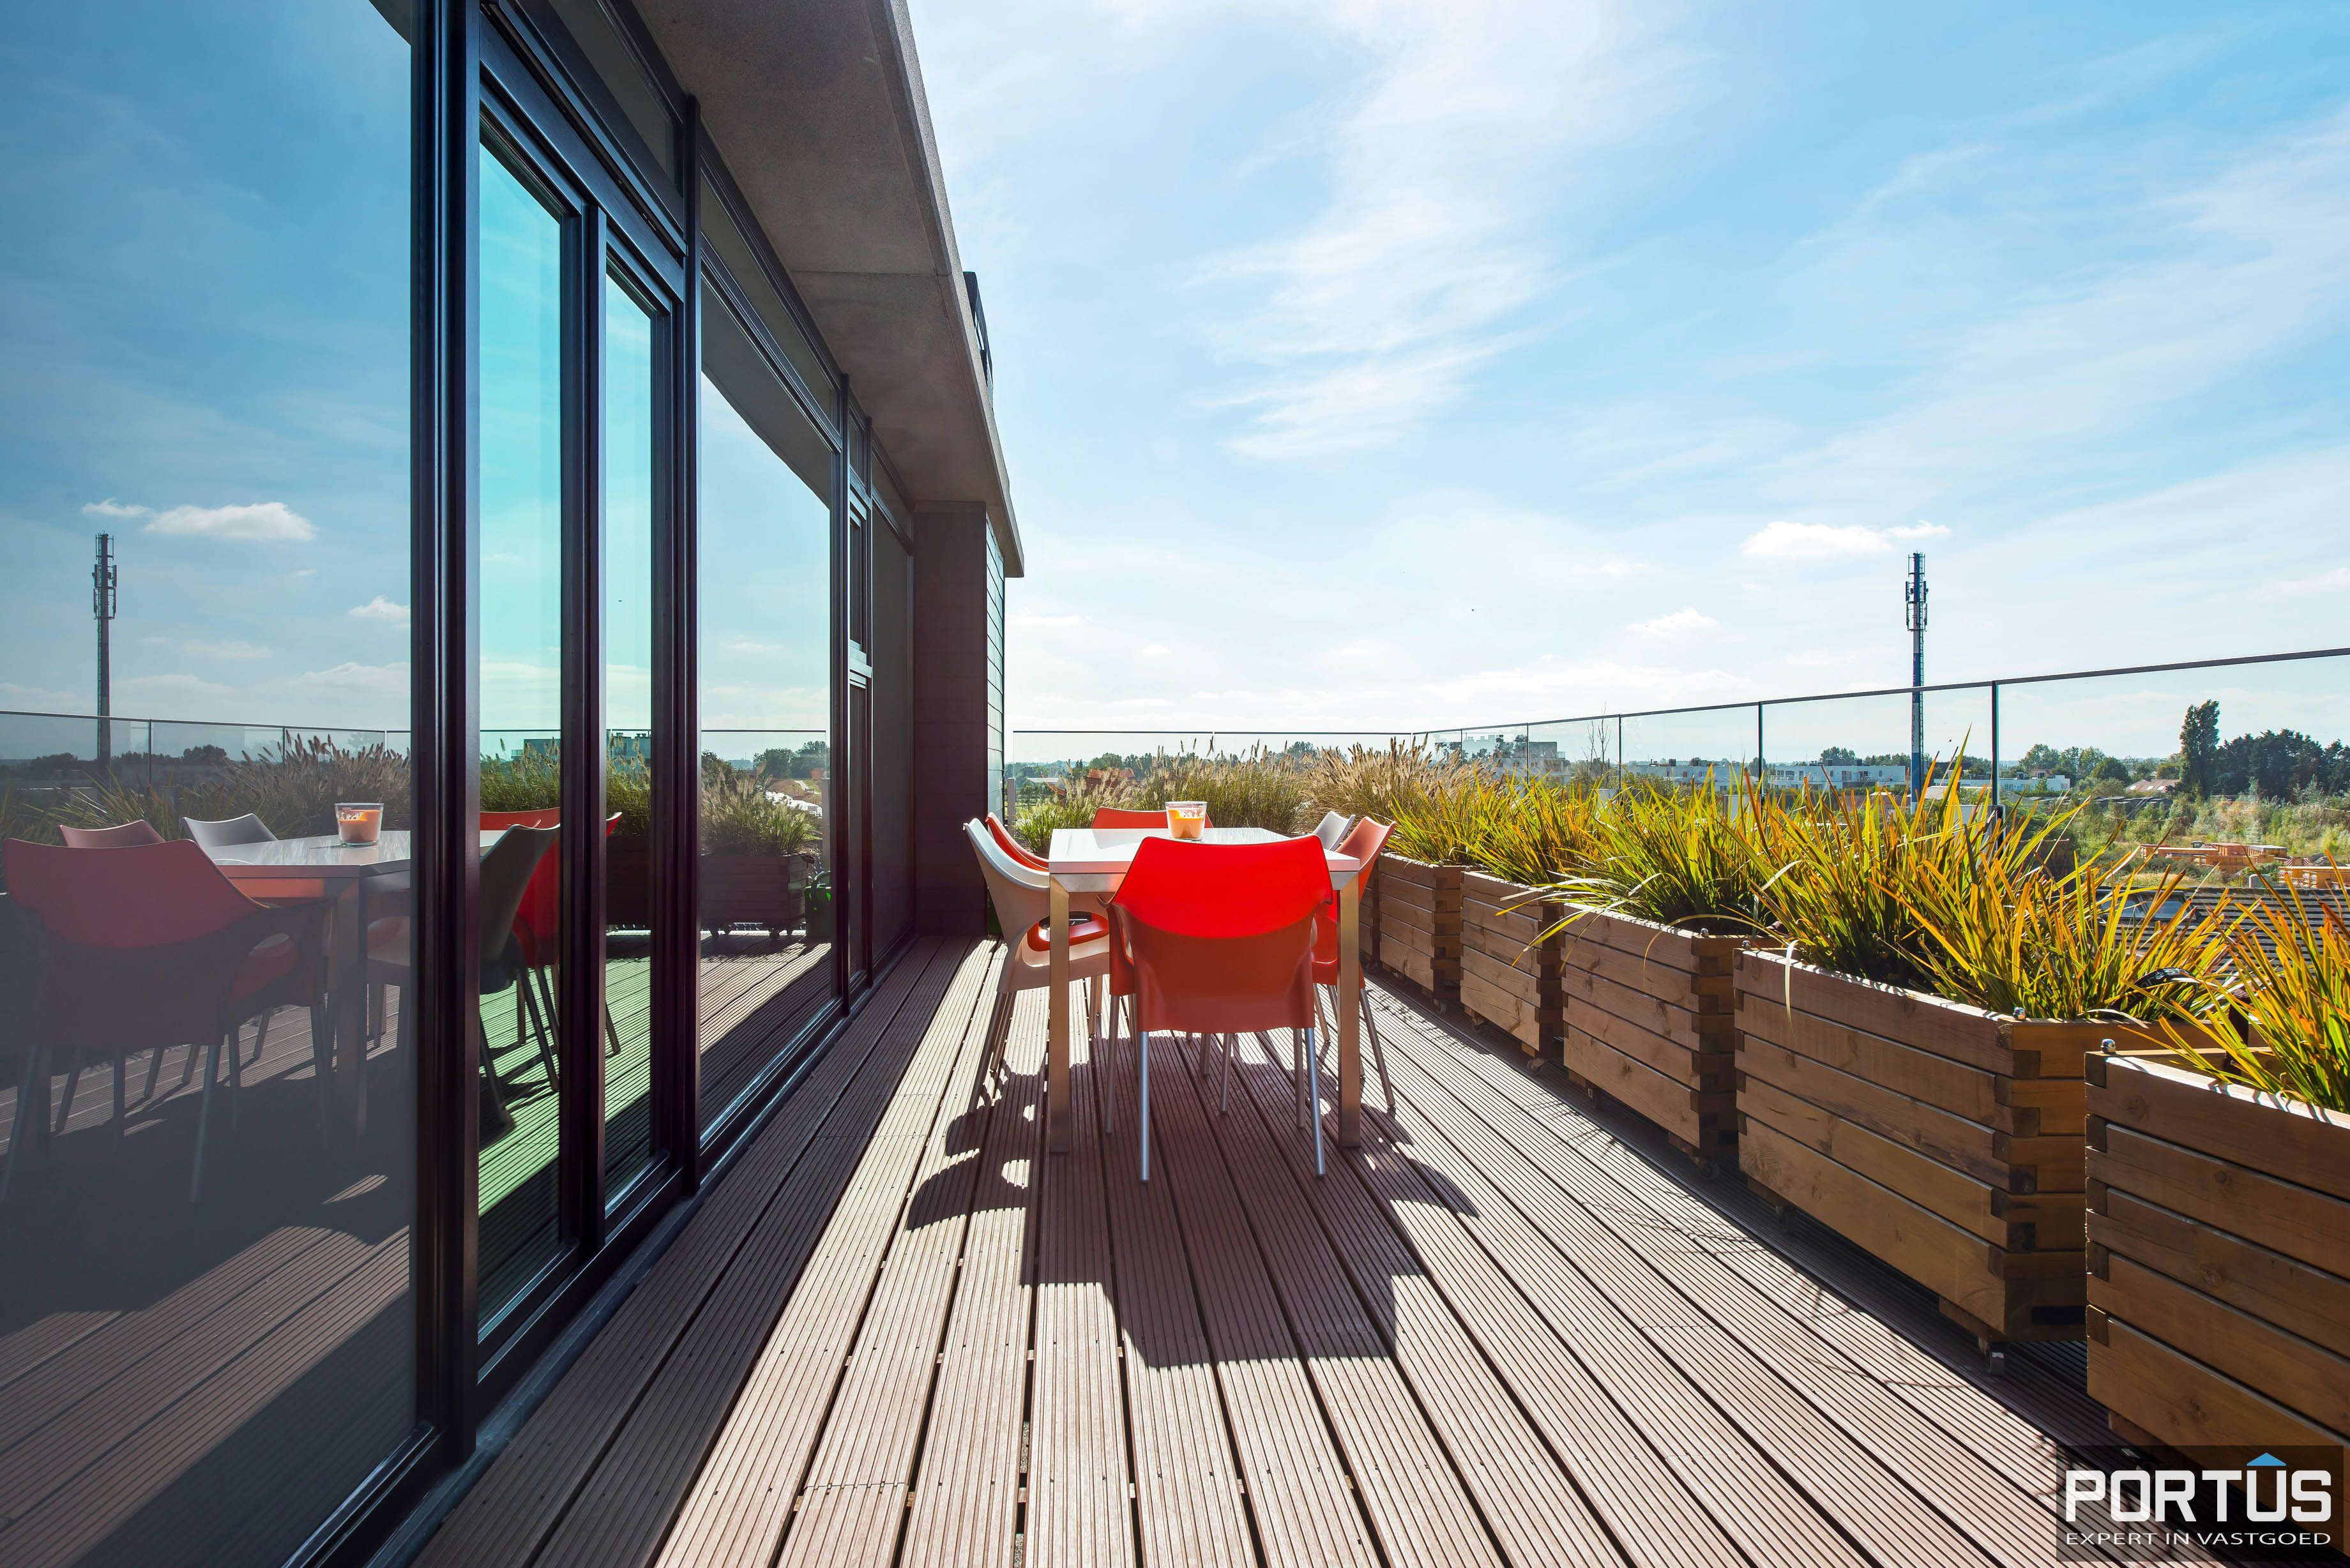 Exclusieve penthouse met 3 slaapkamers te koop te Nieuwpoort - 10930